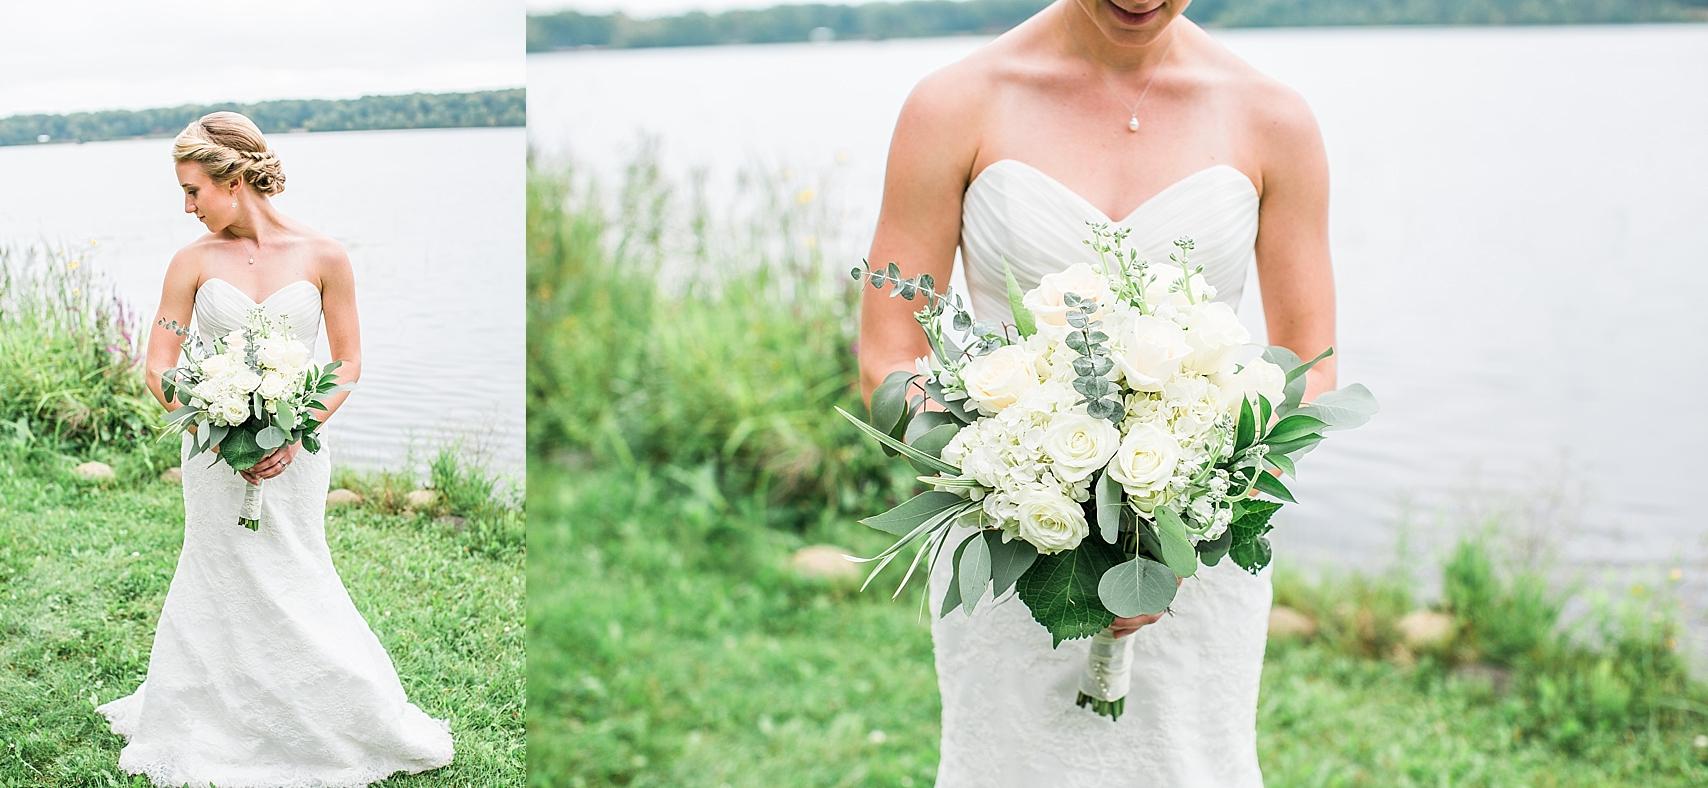 Minnesota Minneapolis Wedding Photographer Best Of 2018 Weddings Mallory Kiesow Photography_0035.jpg